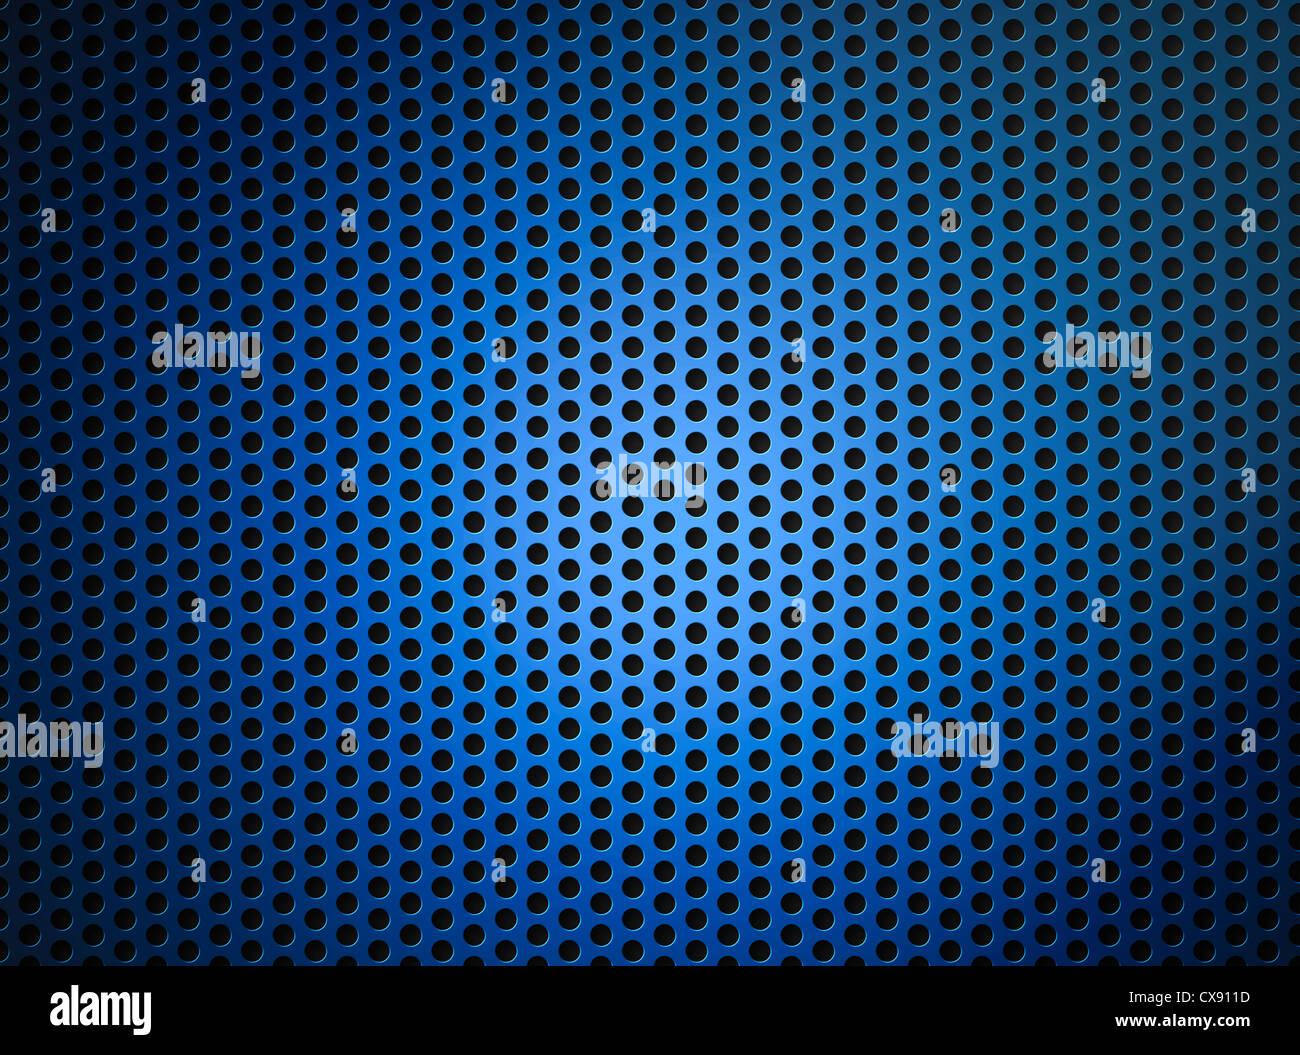 blau metallic Raster oder Gitter Hintergrund Stockbild